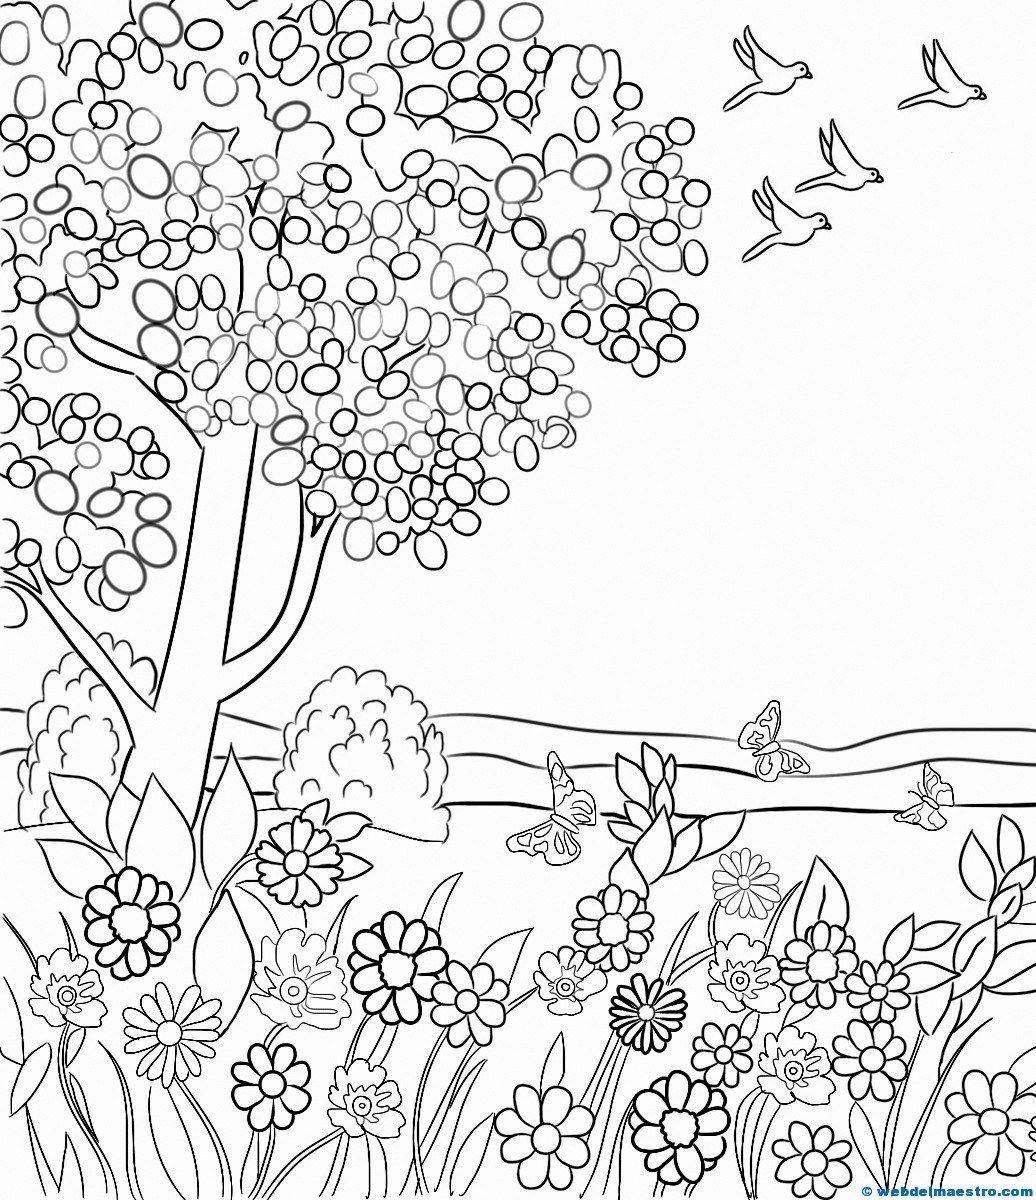 Paisajes para pintar | Primavera | Pinterest | Descargar paisajes ...